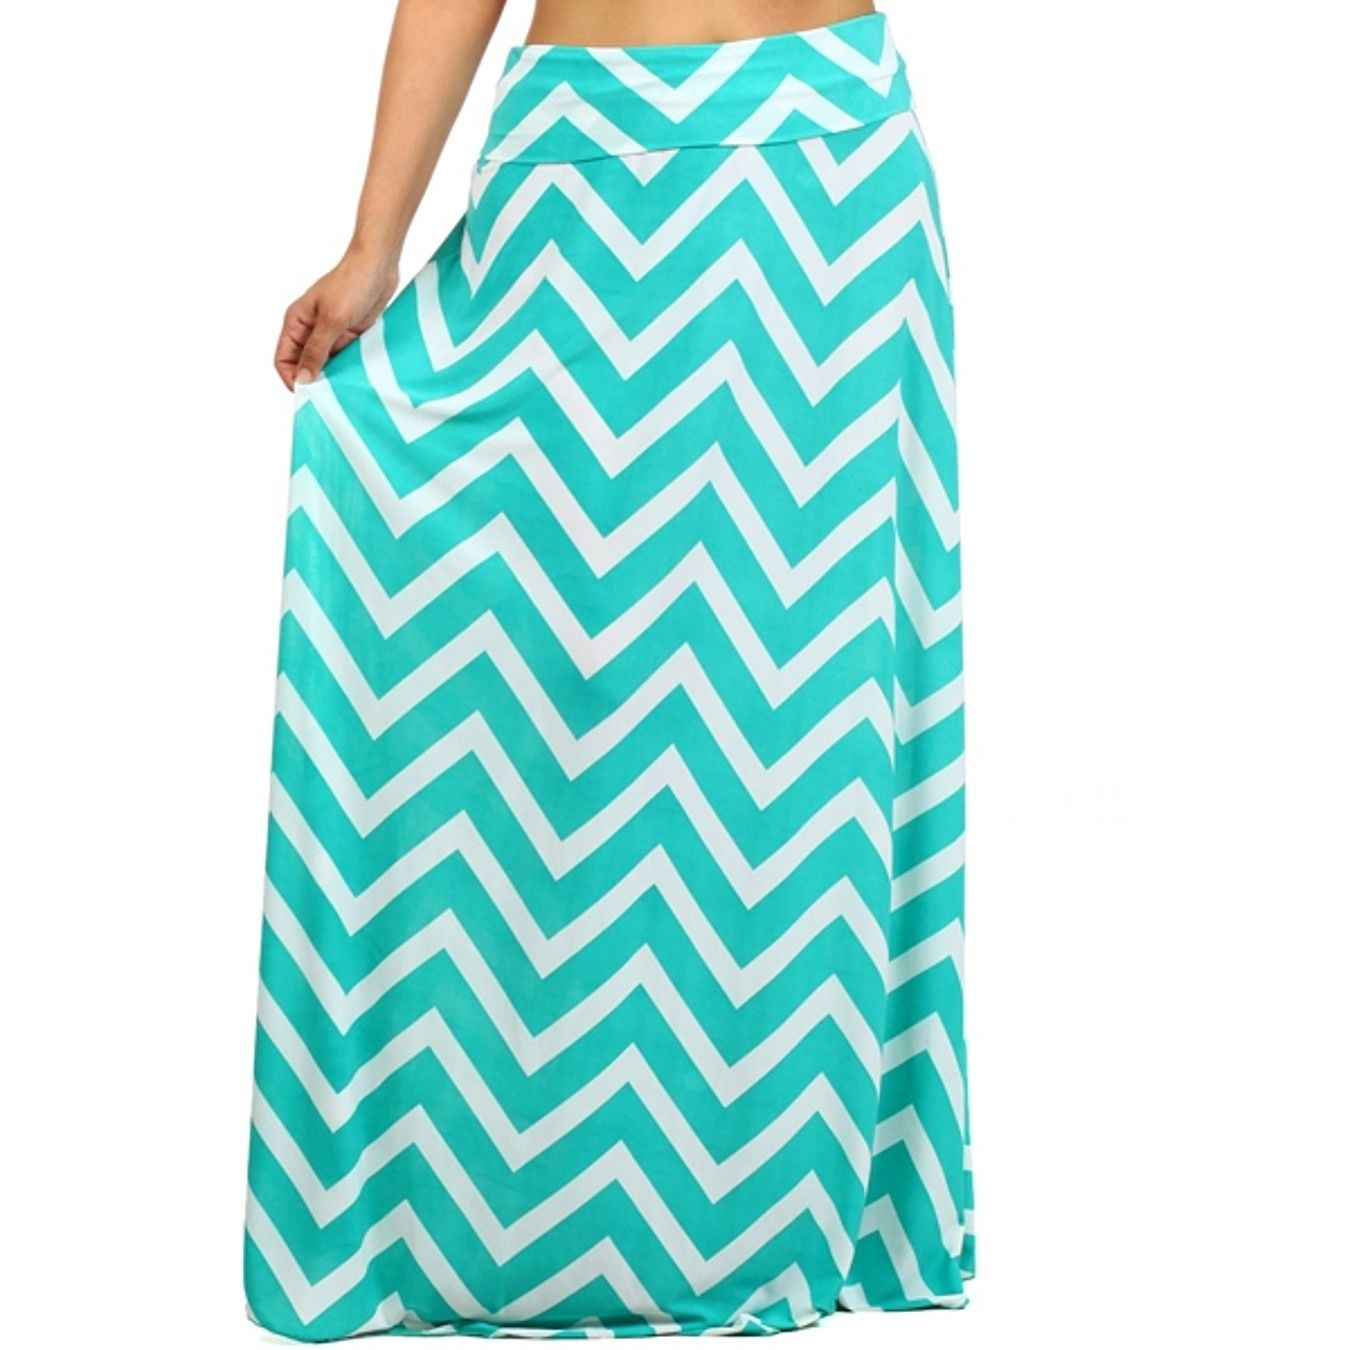 Calixa Chevron Zigzag Print Maxi Skirt -Plus Size by Fashions For Divas